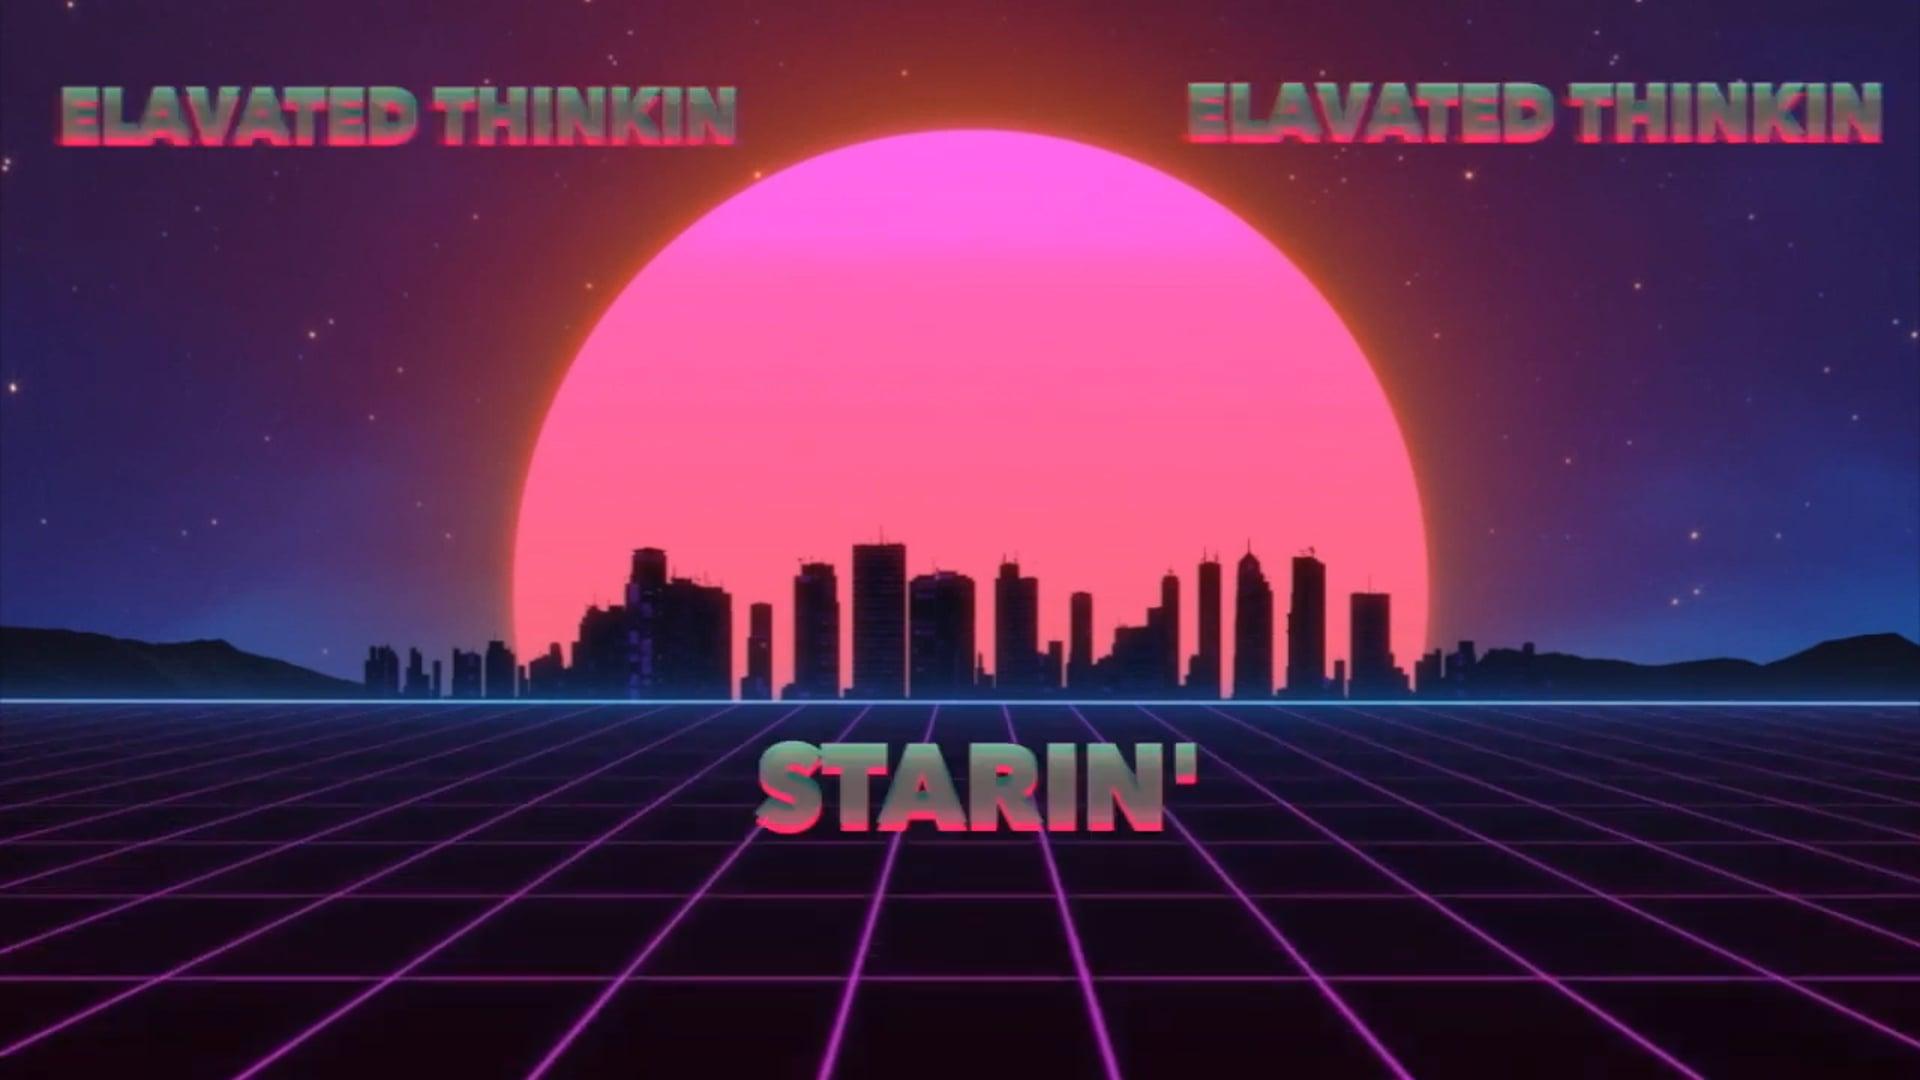 Elavated Thinkin (Music) – Jasmine Garner